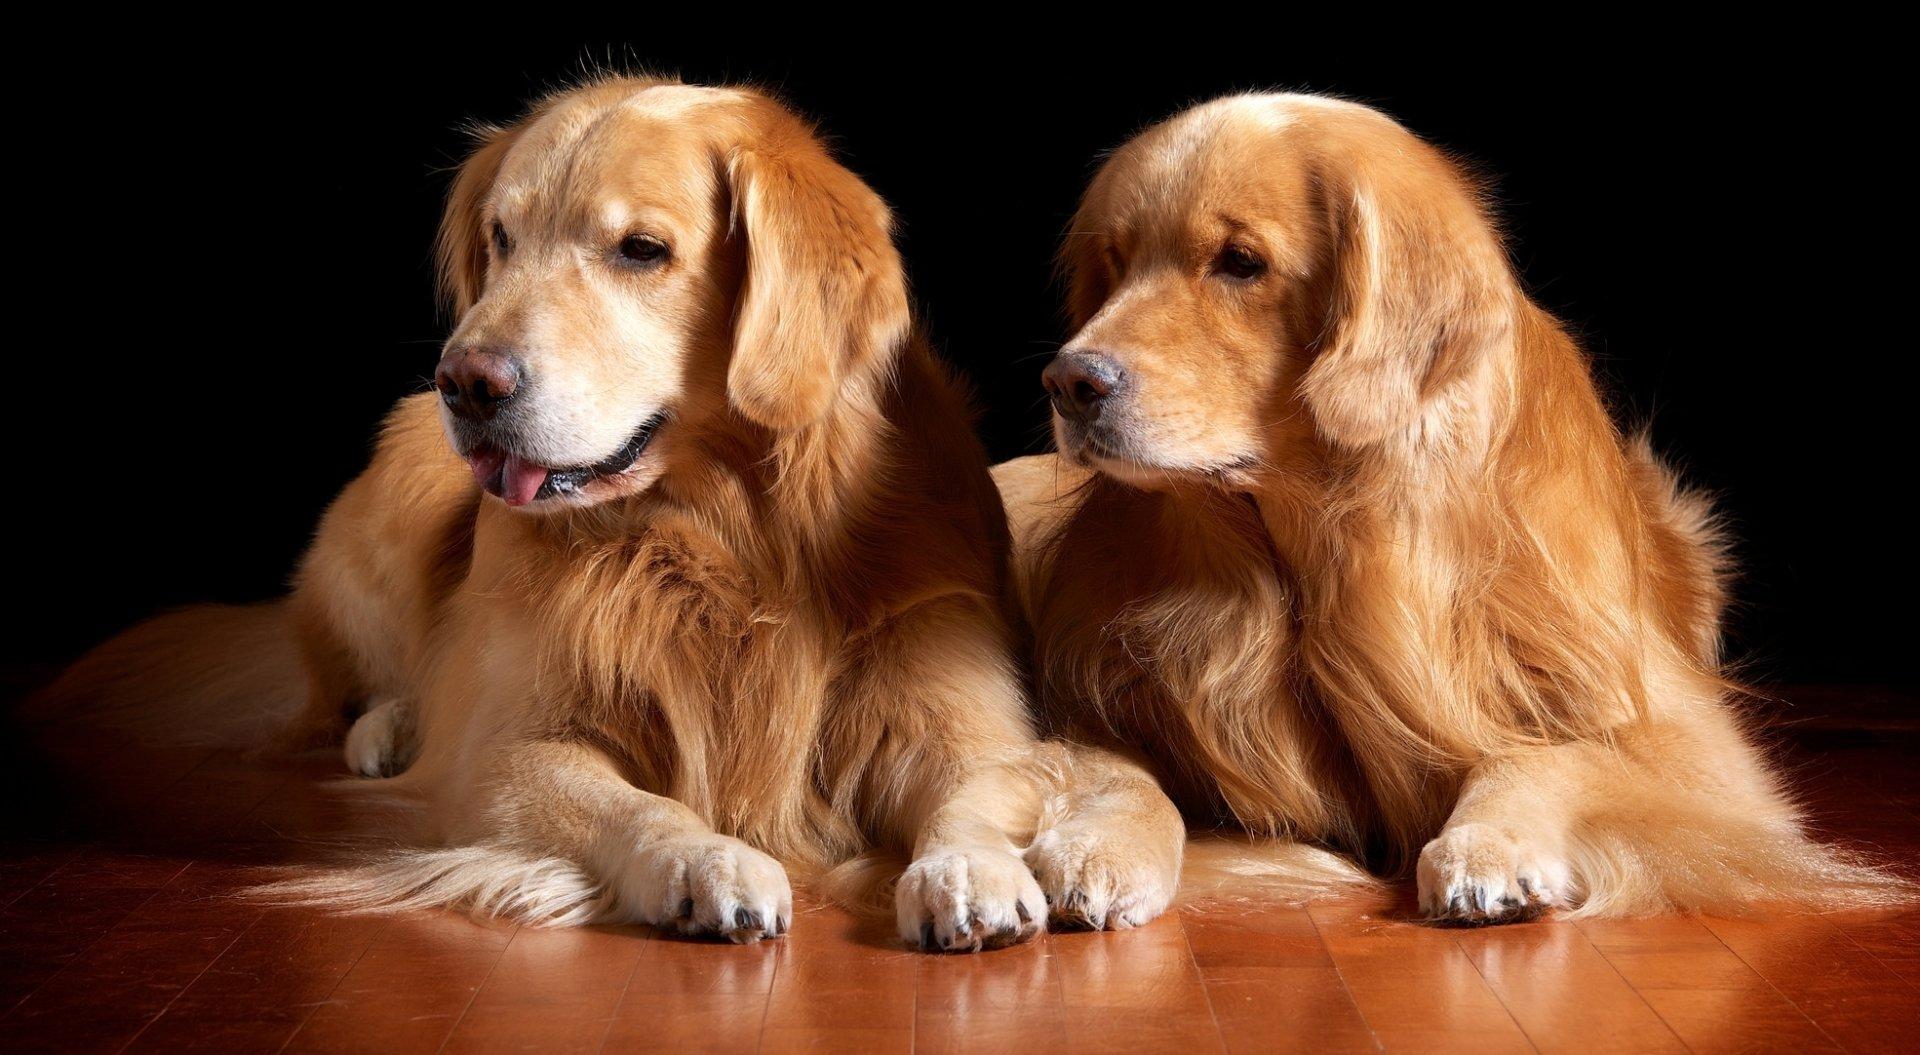 Animal - Golden Retriever  Dog Puppy Wallpaper